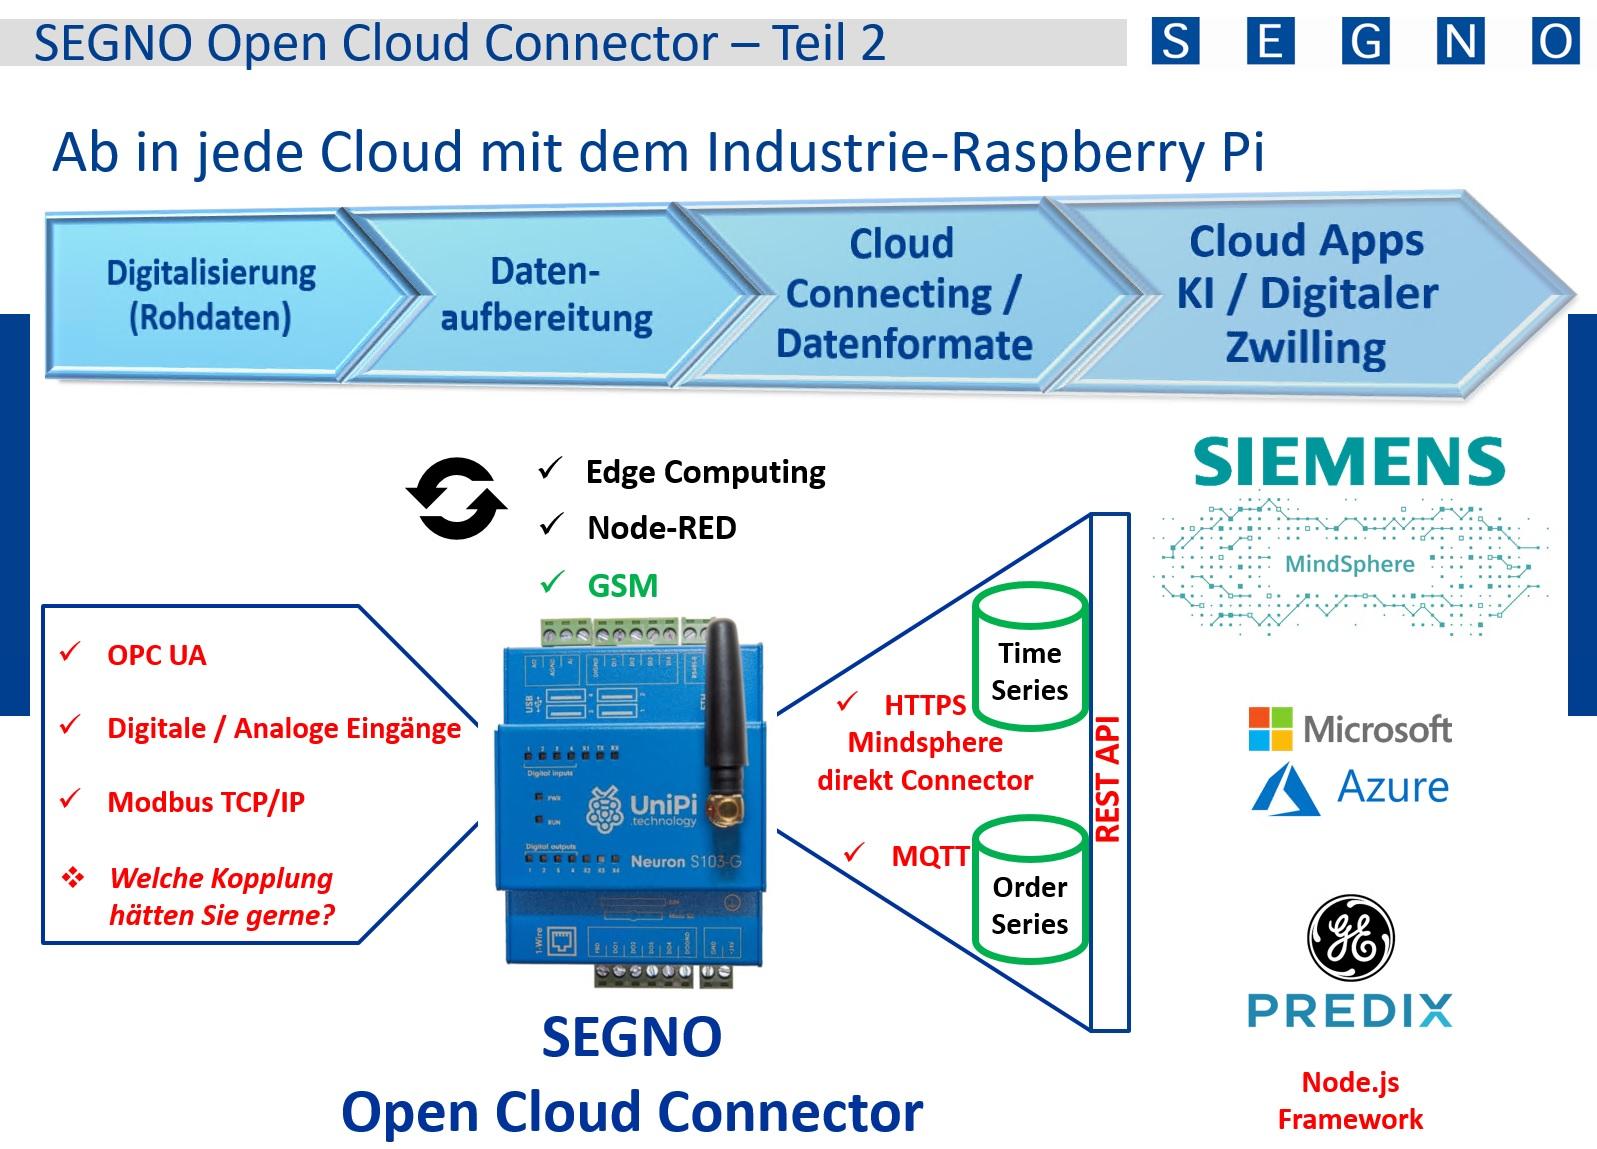 SEGNO Open Cloud Connector